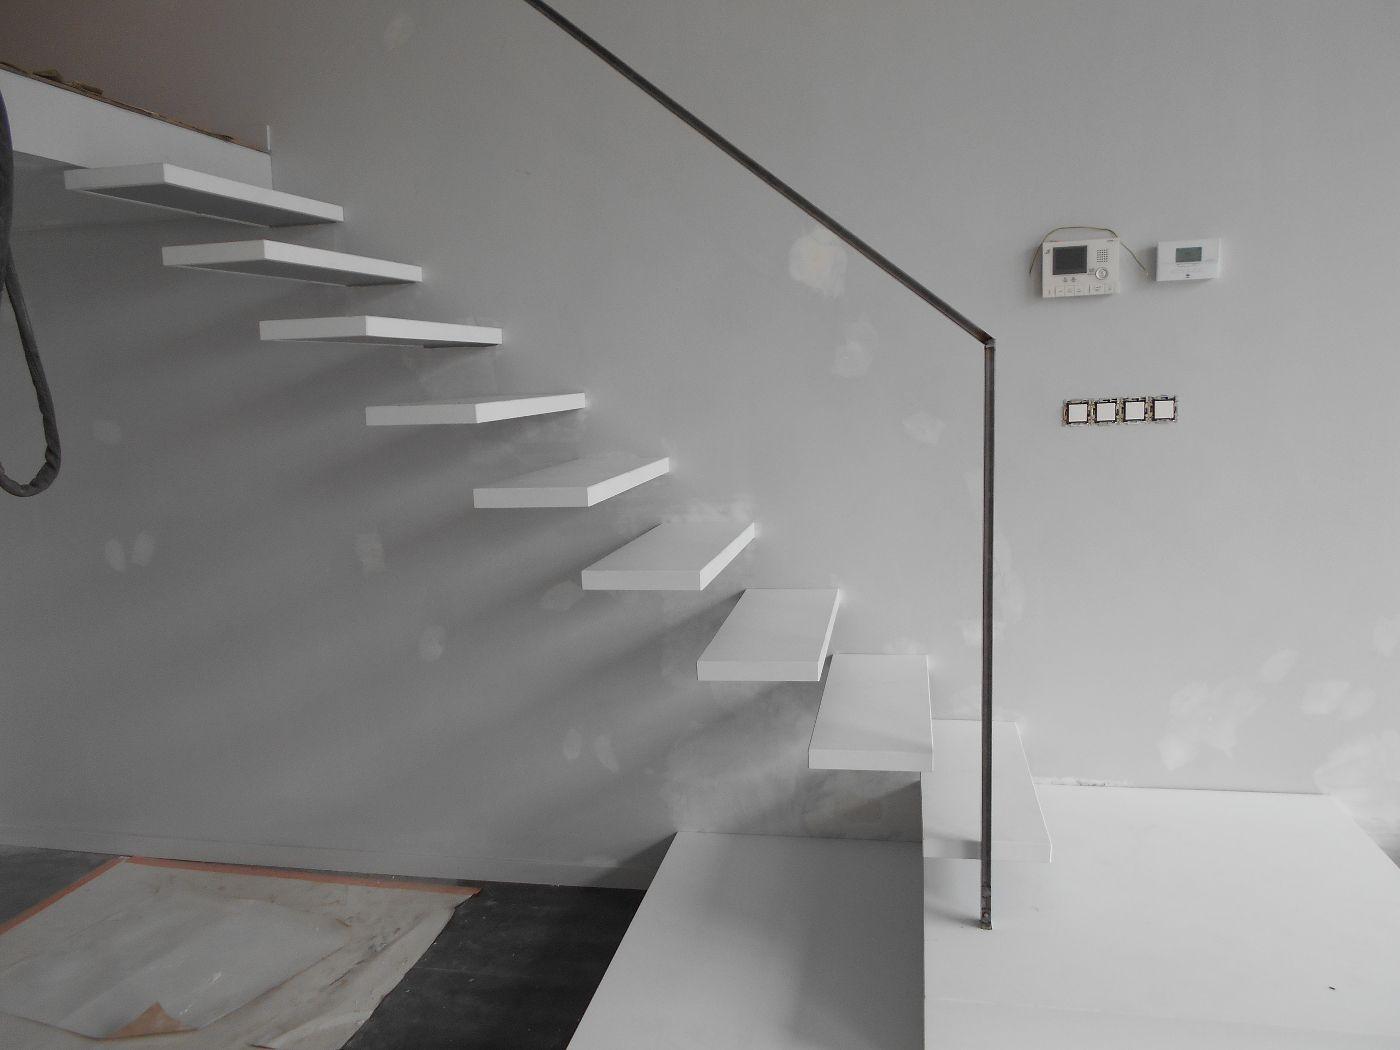 escalier flottant fabulous source steven ginn architects. Black Bedroom Furniture Sets. Home Design Ideas